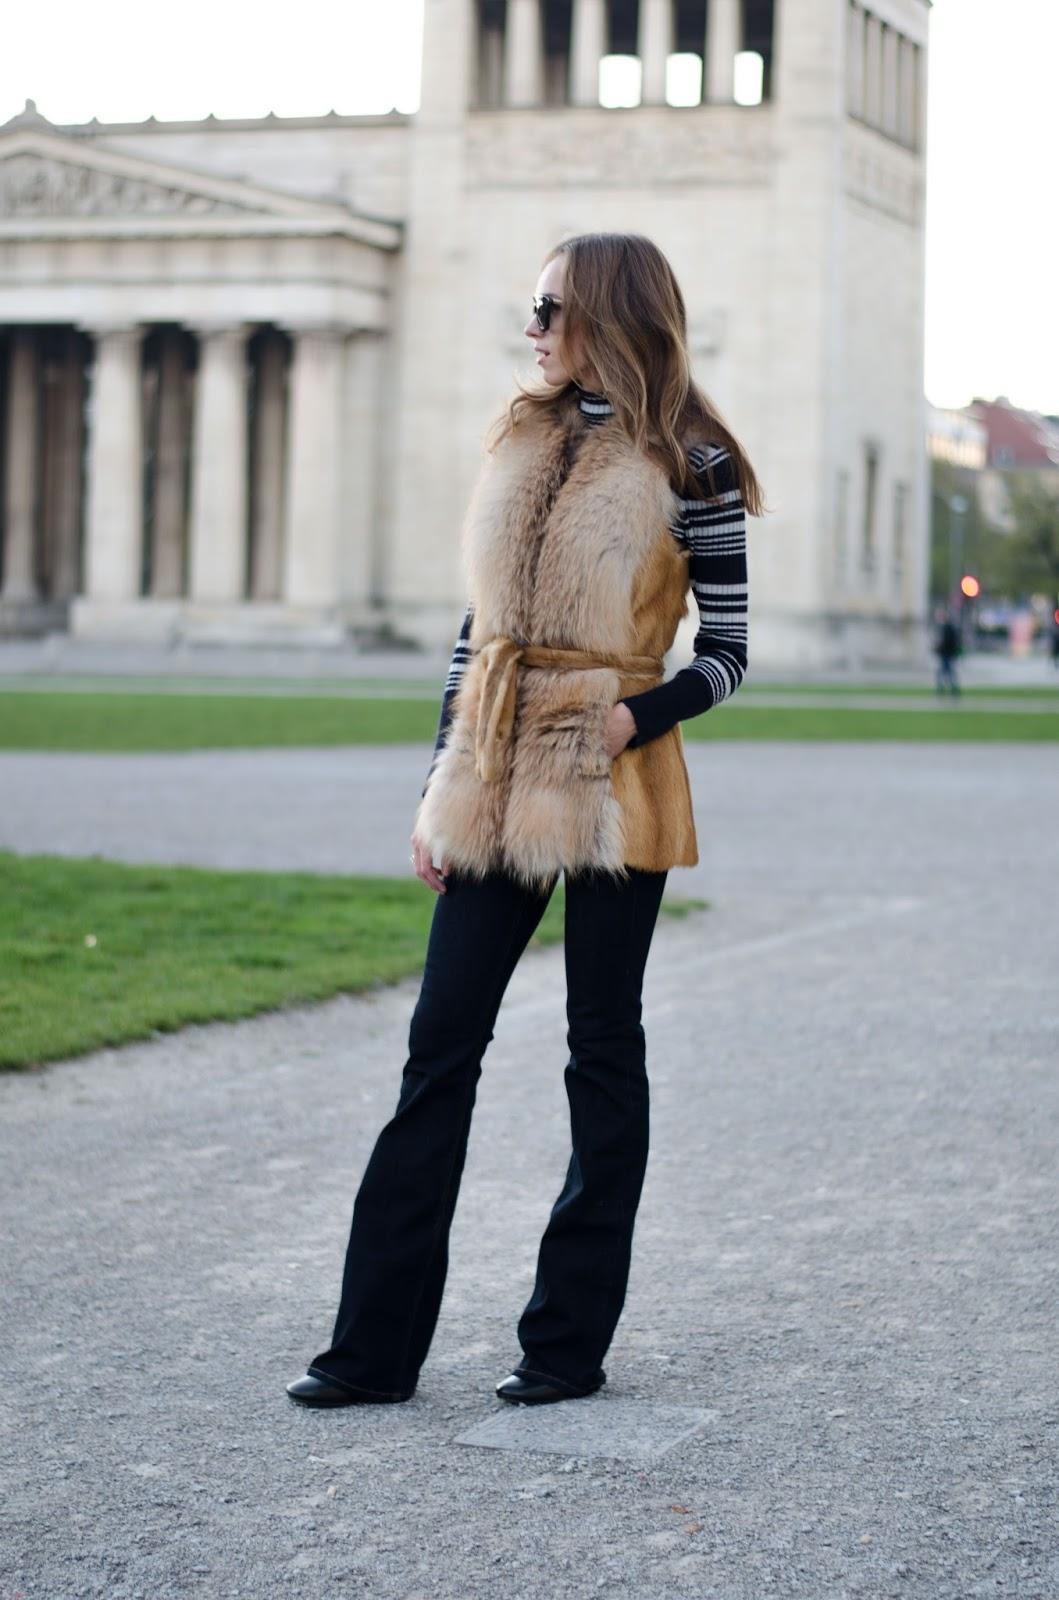 kristjaana mere flare jeans denim fox fur vest fall outfit inspo 70s